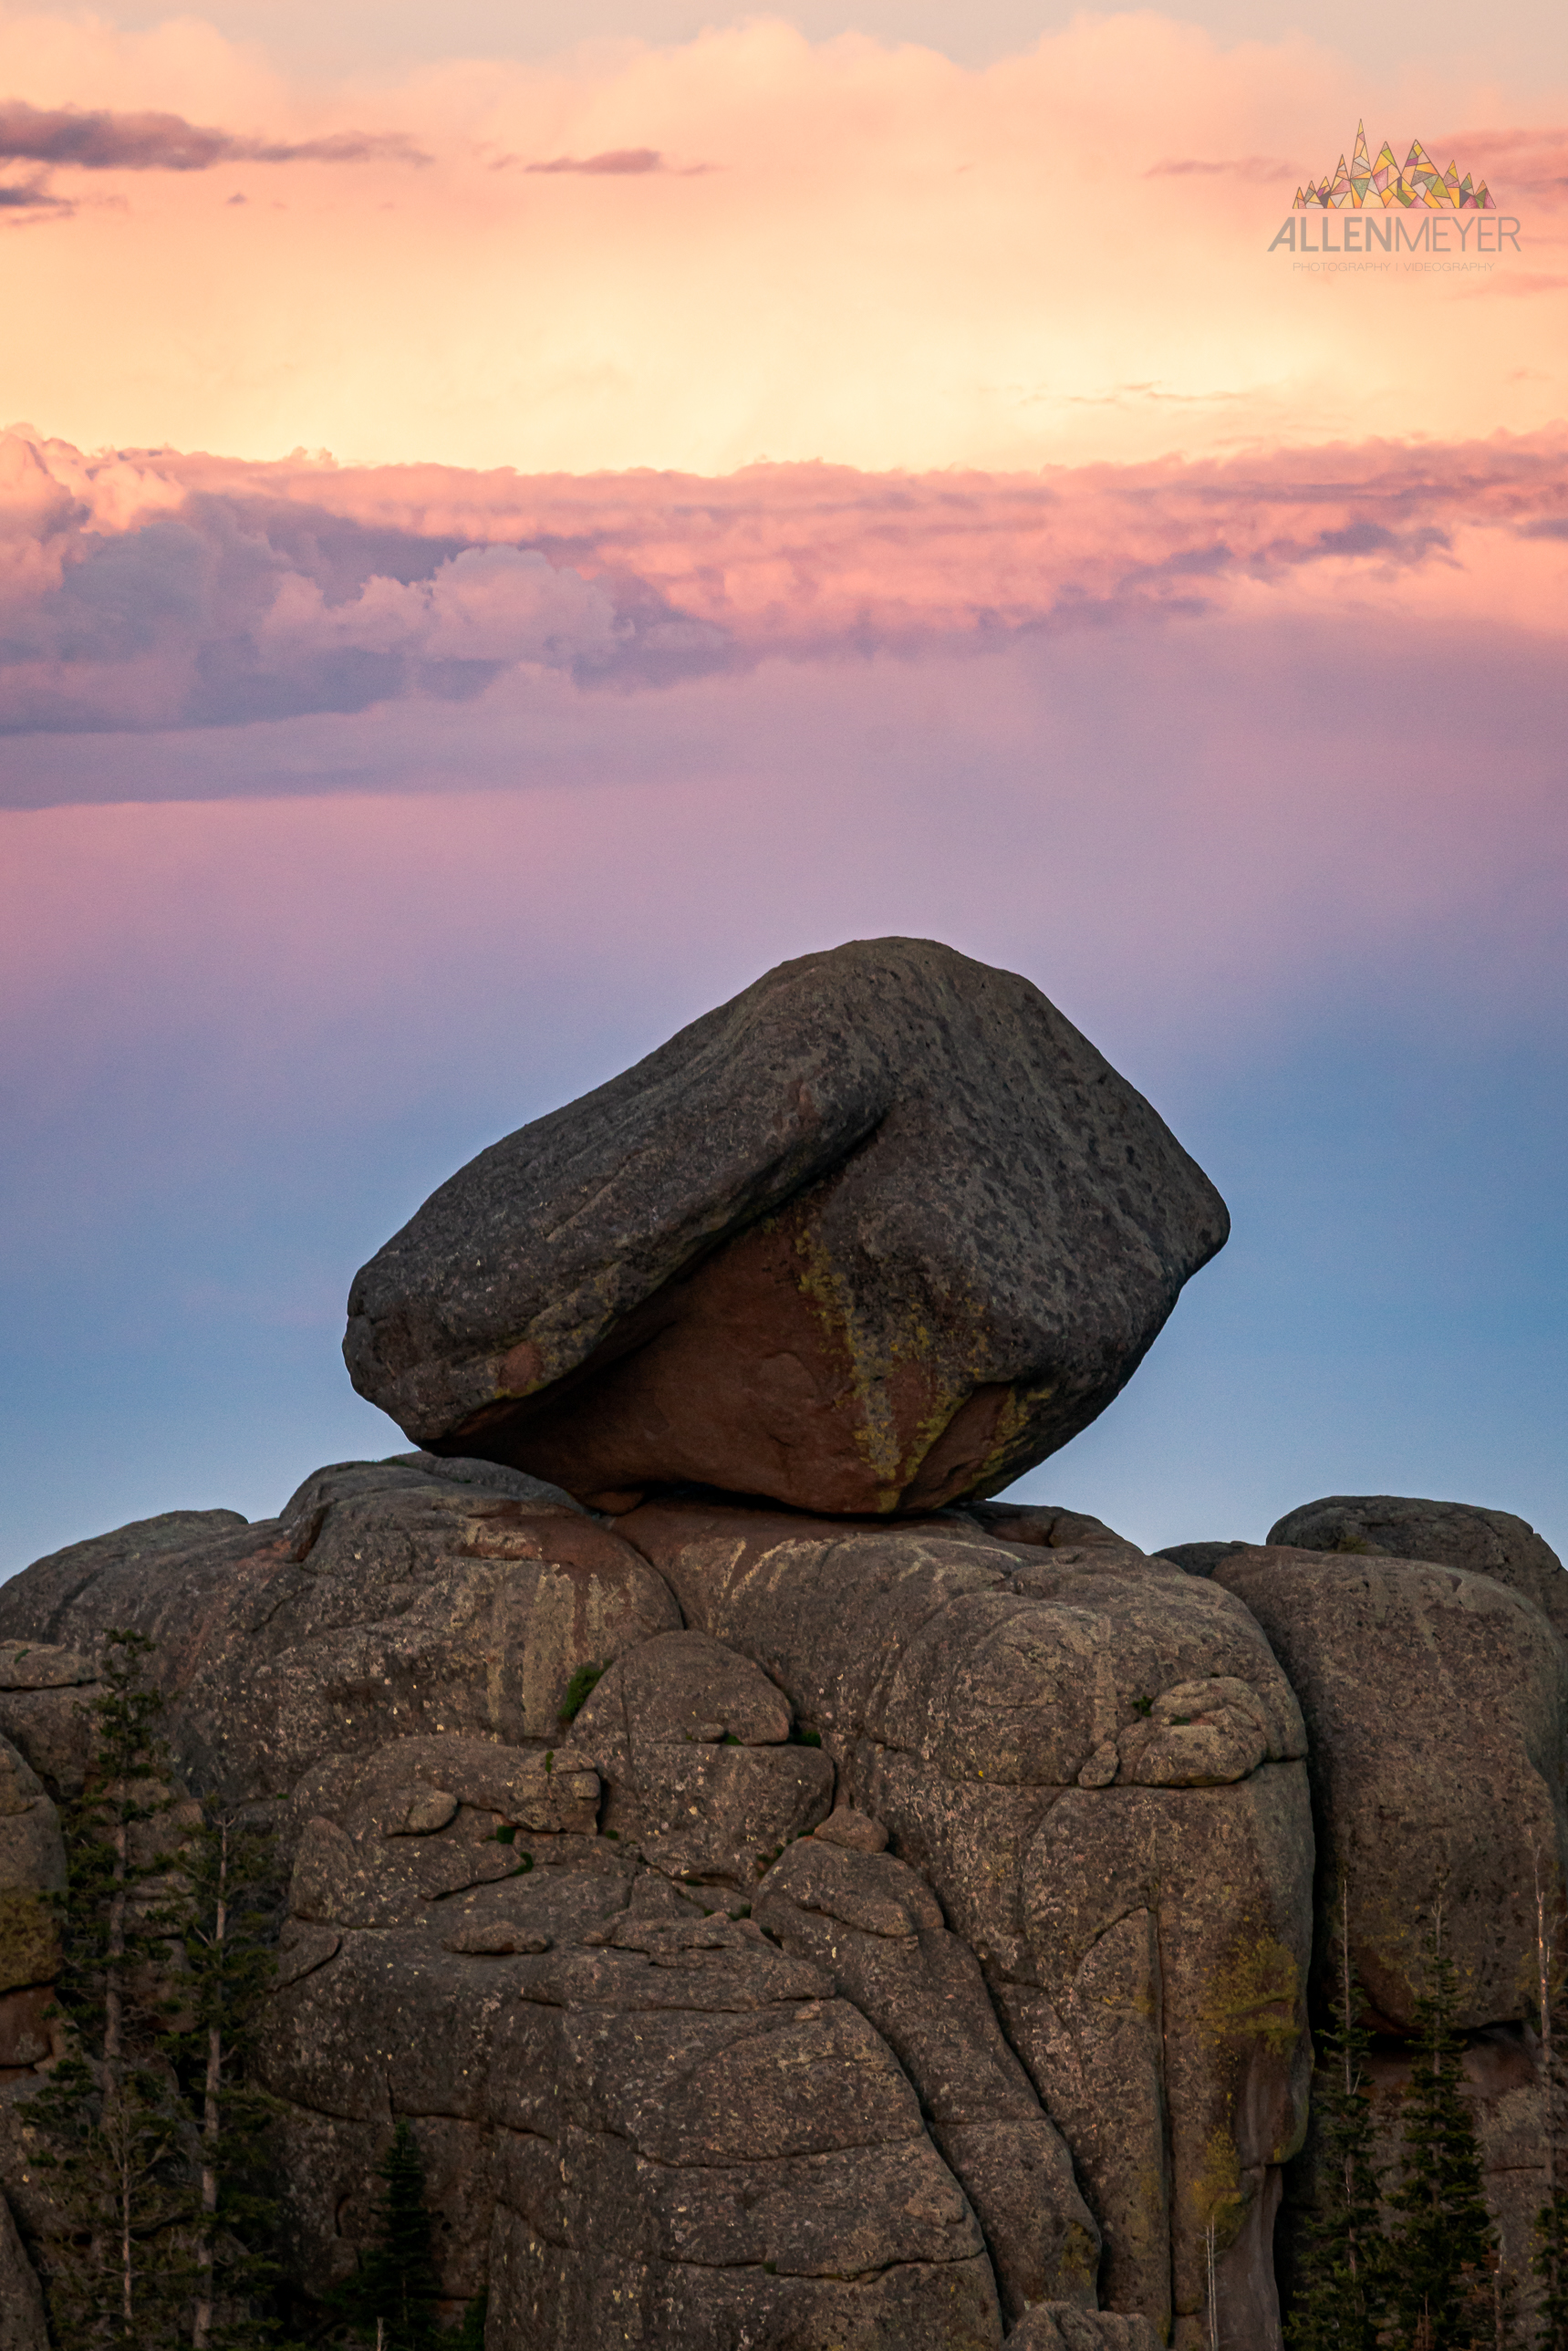 Outdoor Adventures In Cheyenne, Wyoming; Photography by Allen Meyer-05746.jpg